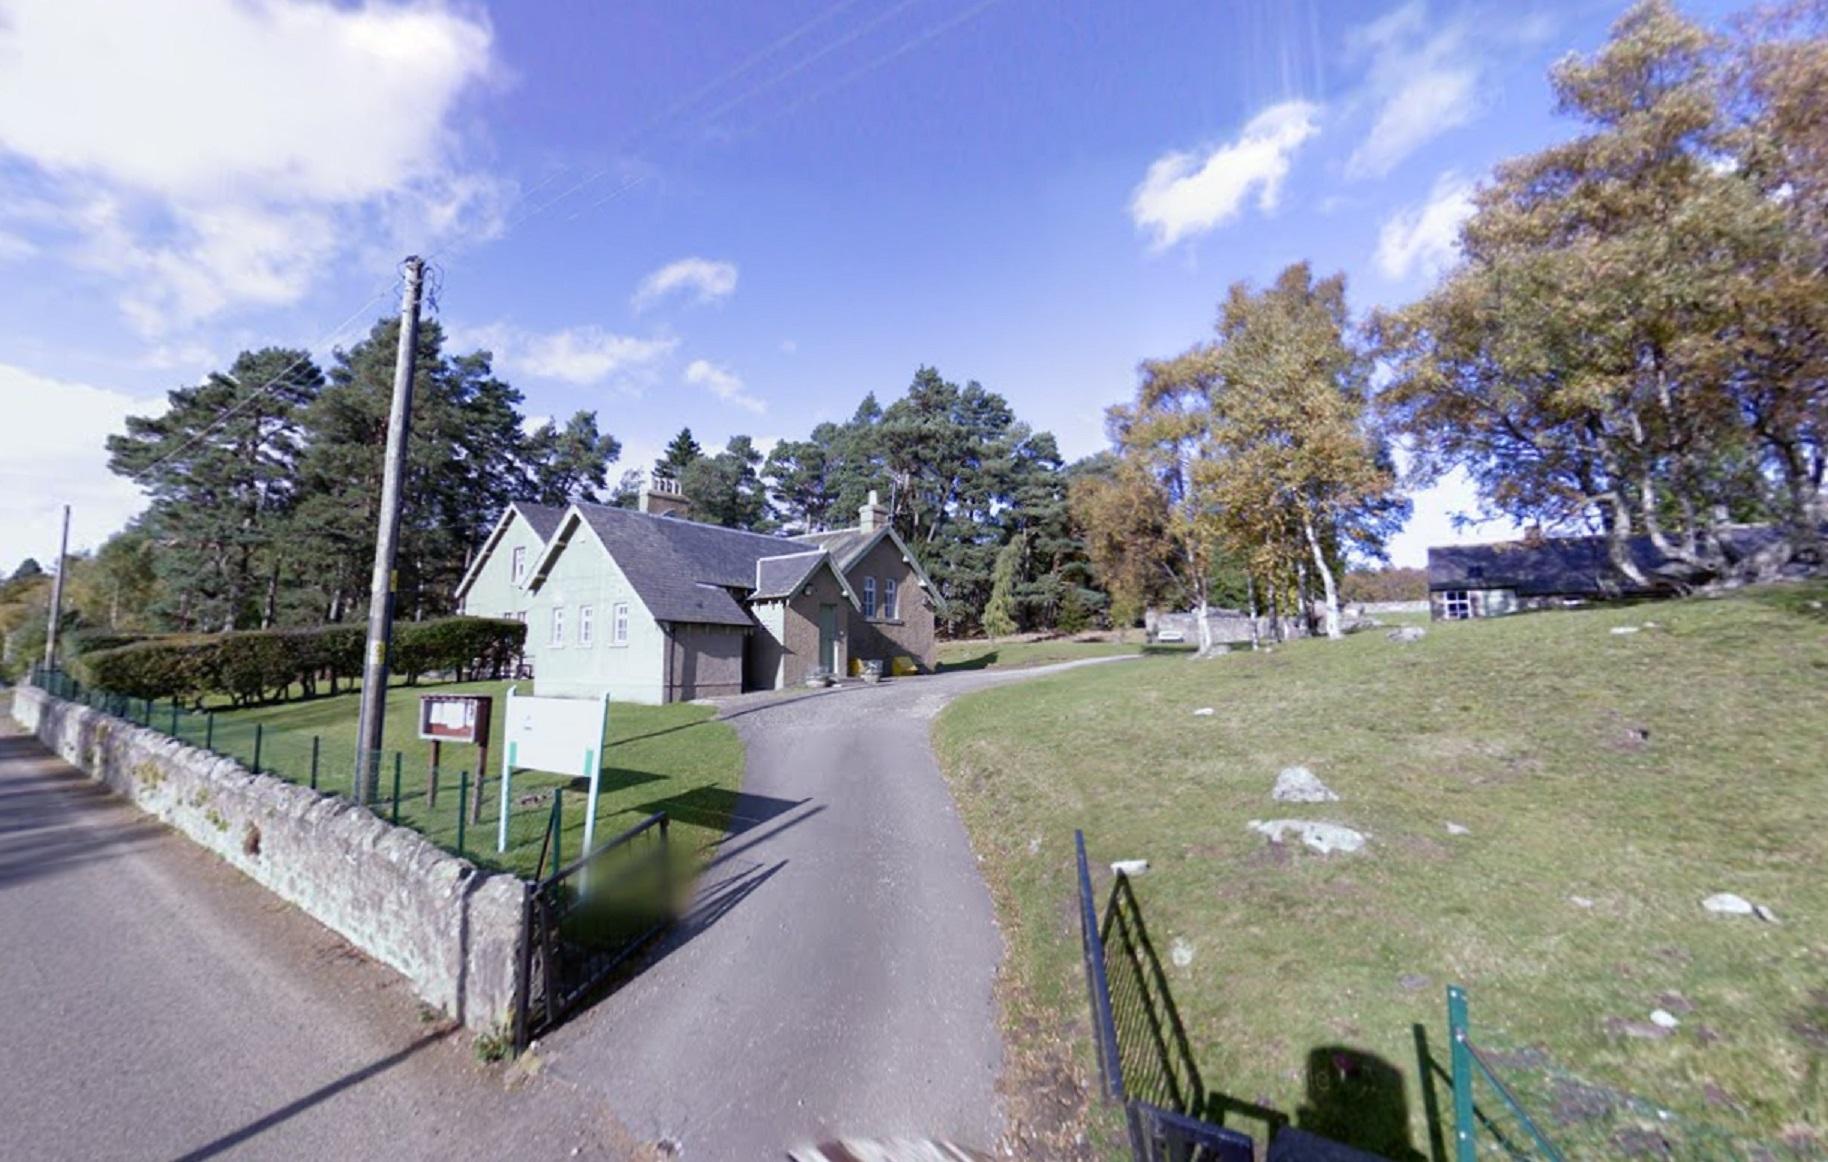 Tarfside primary school.